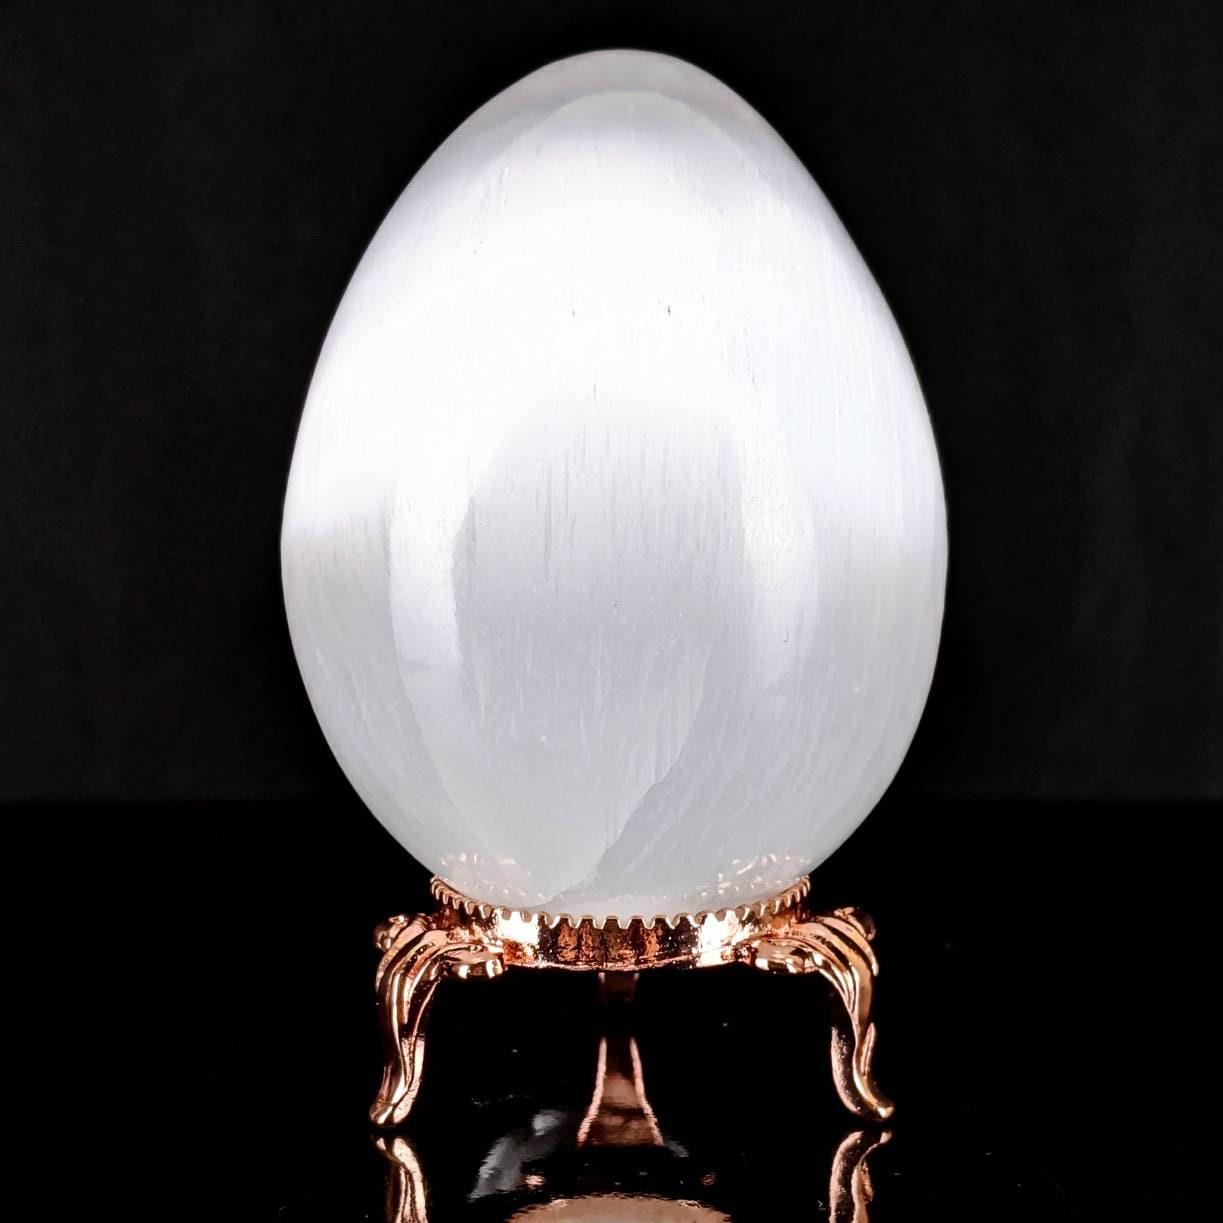 Selenite XXL Sphere 4.5-5 Meditation Satin Spar Crystal Ball Healing Gypsum Reiki Spiritual Crown Chakra Decor Decorating